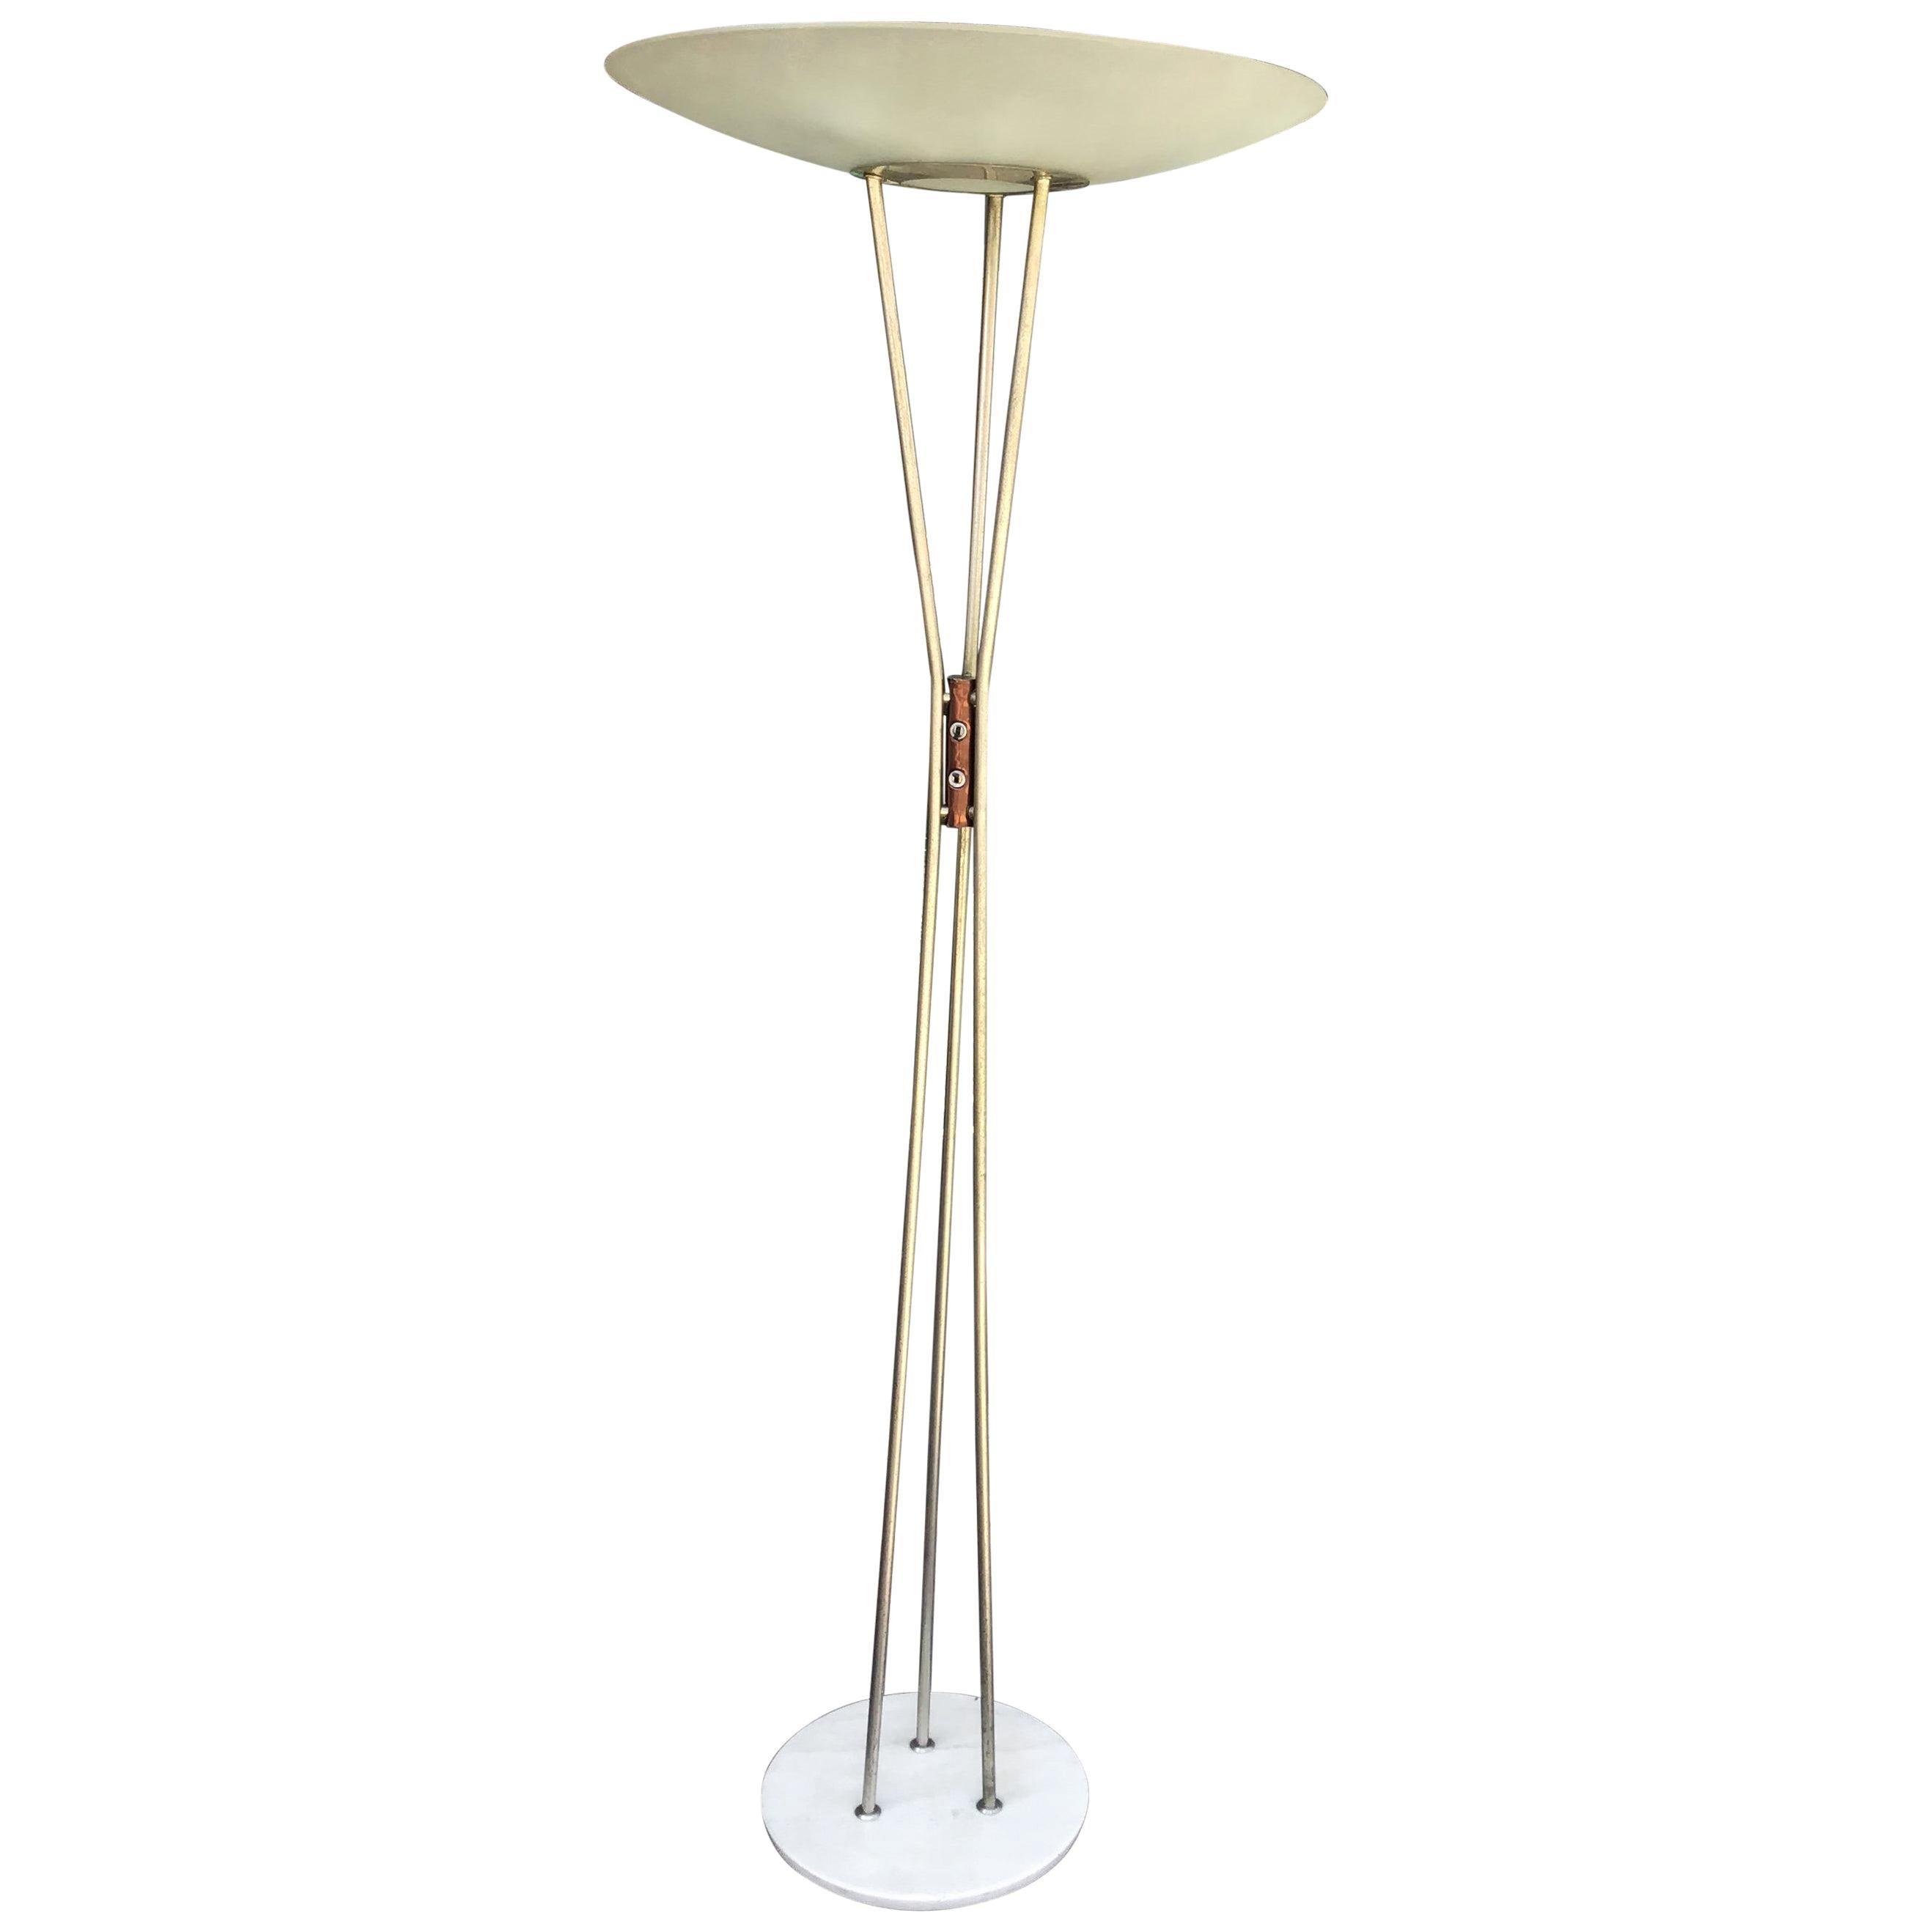 Stilnovo 'Gaetano Sciolari' Floor Lamp, Model 4075, Marble Base and Brass